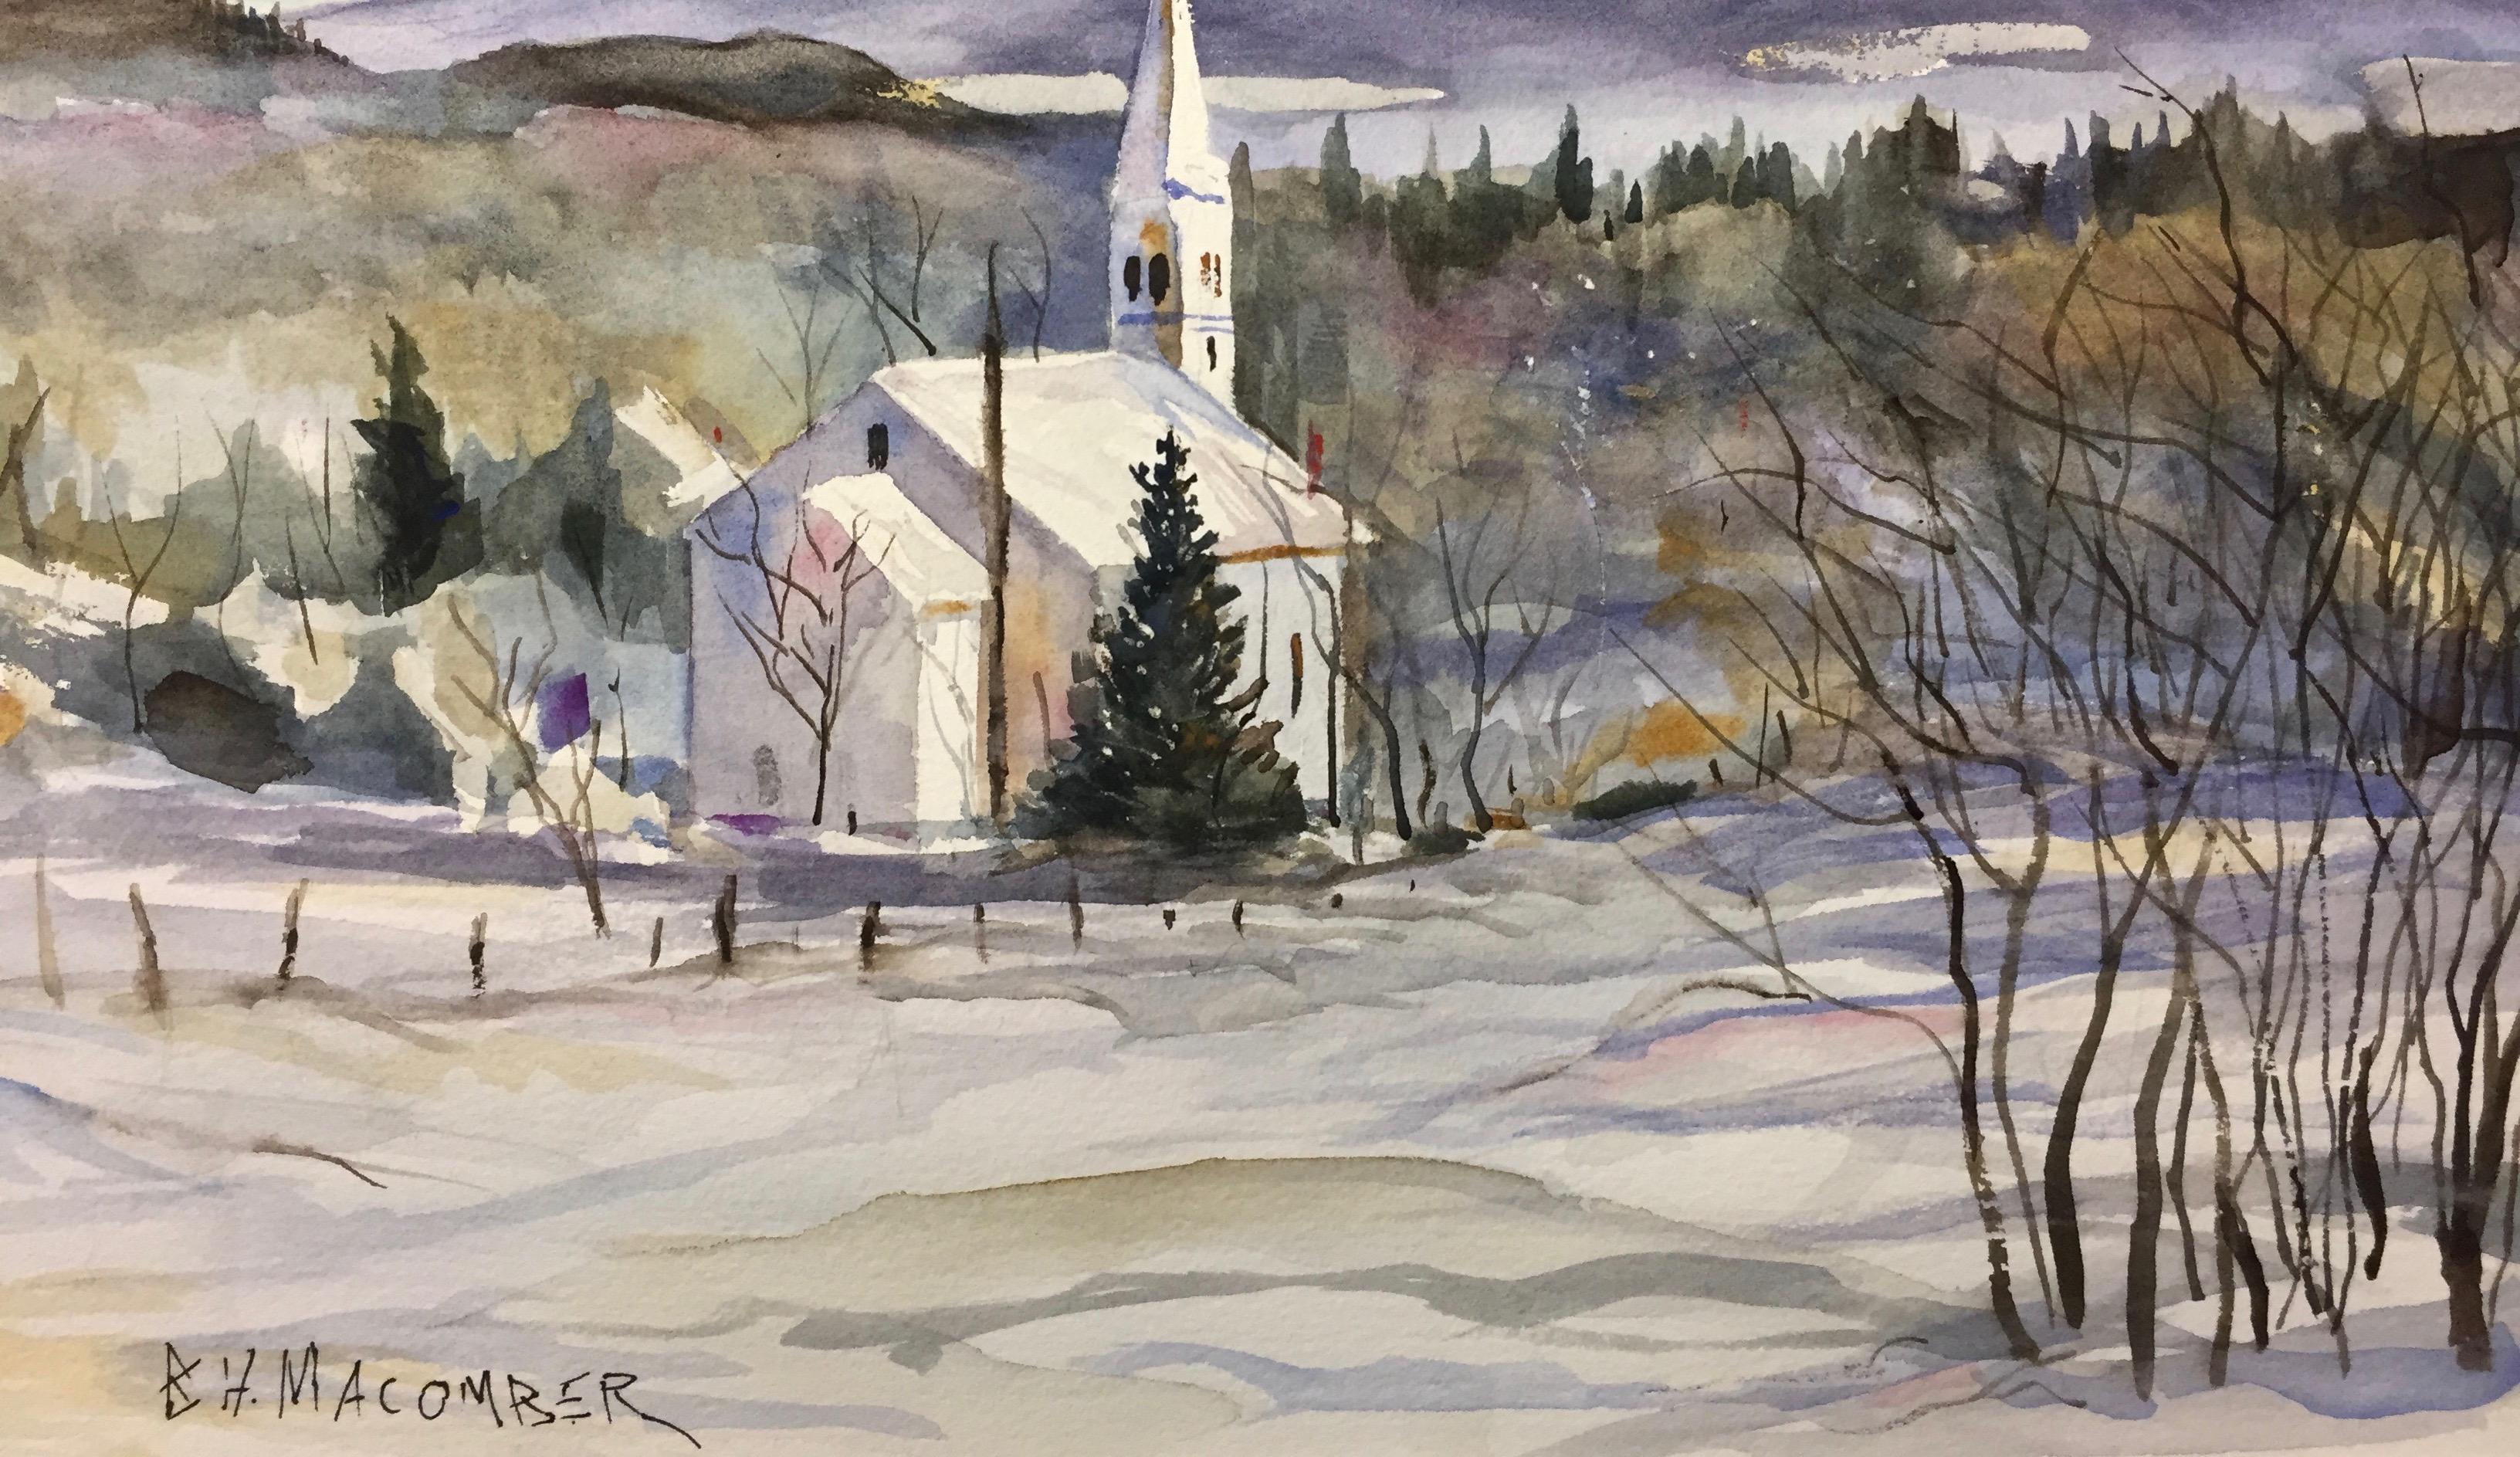 Wondrous Watercolors w/Ben Macomber (Adults 18+)